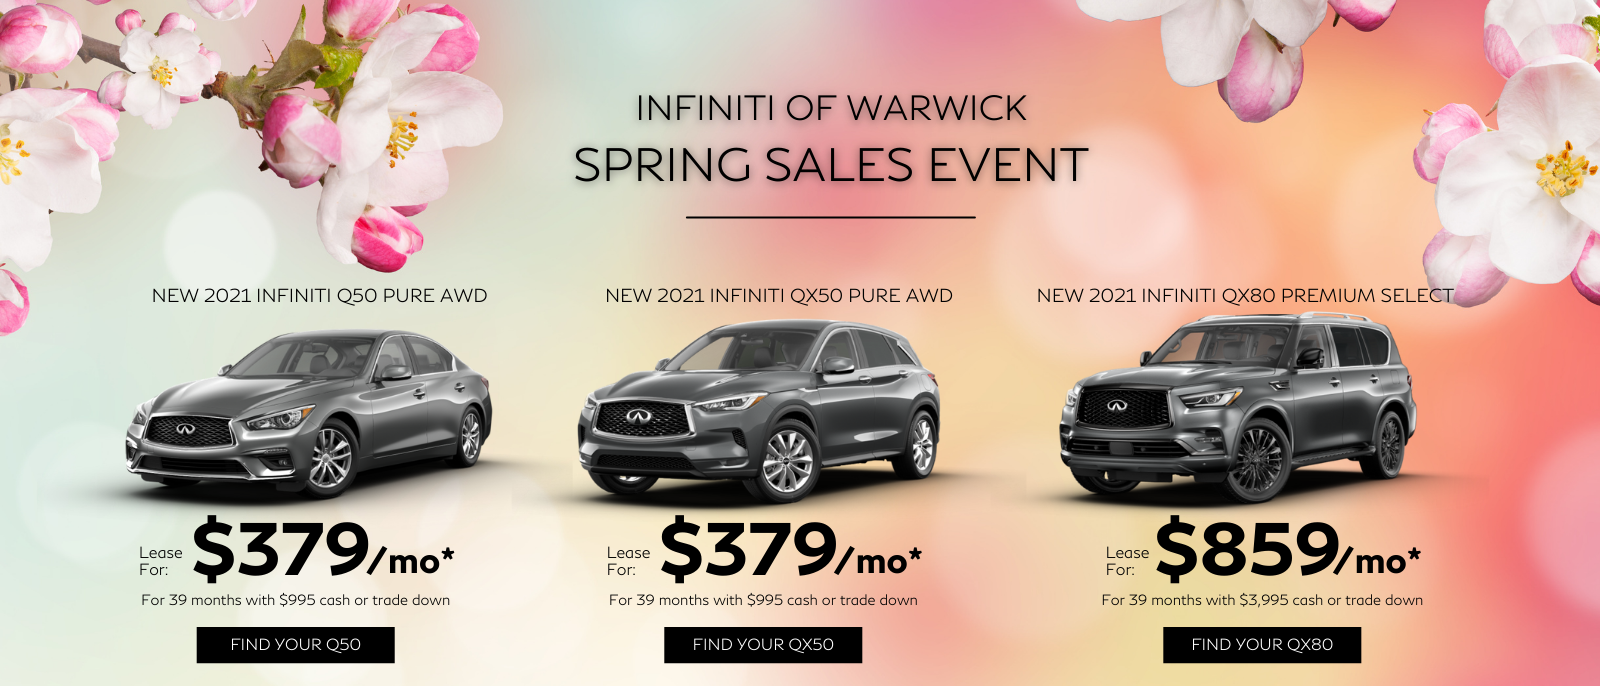 INFINITI OF WARWICK SPRING SALES EVENT